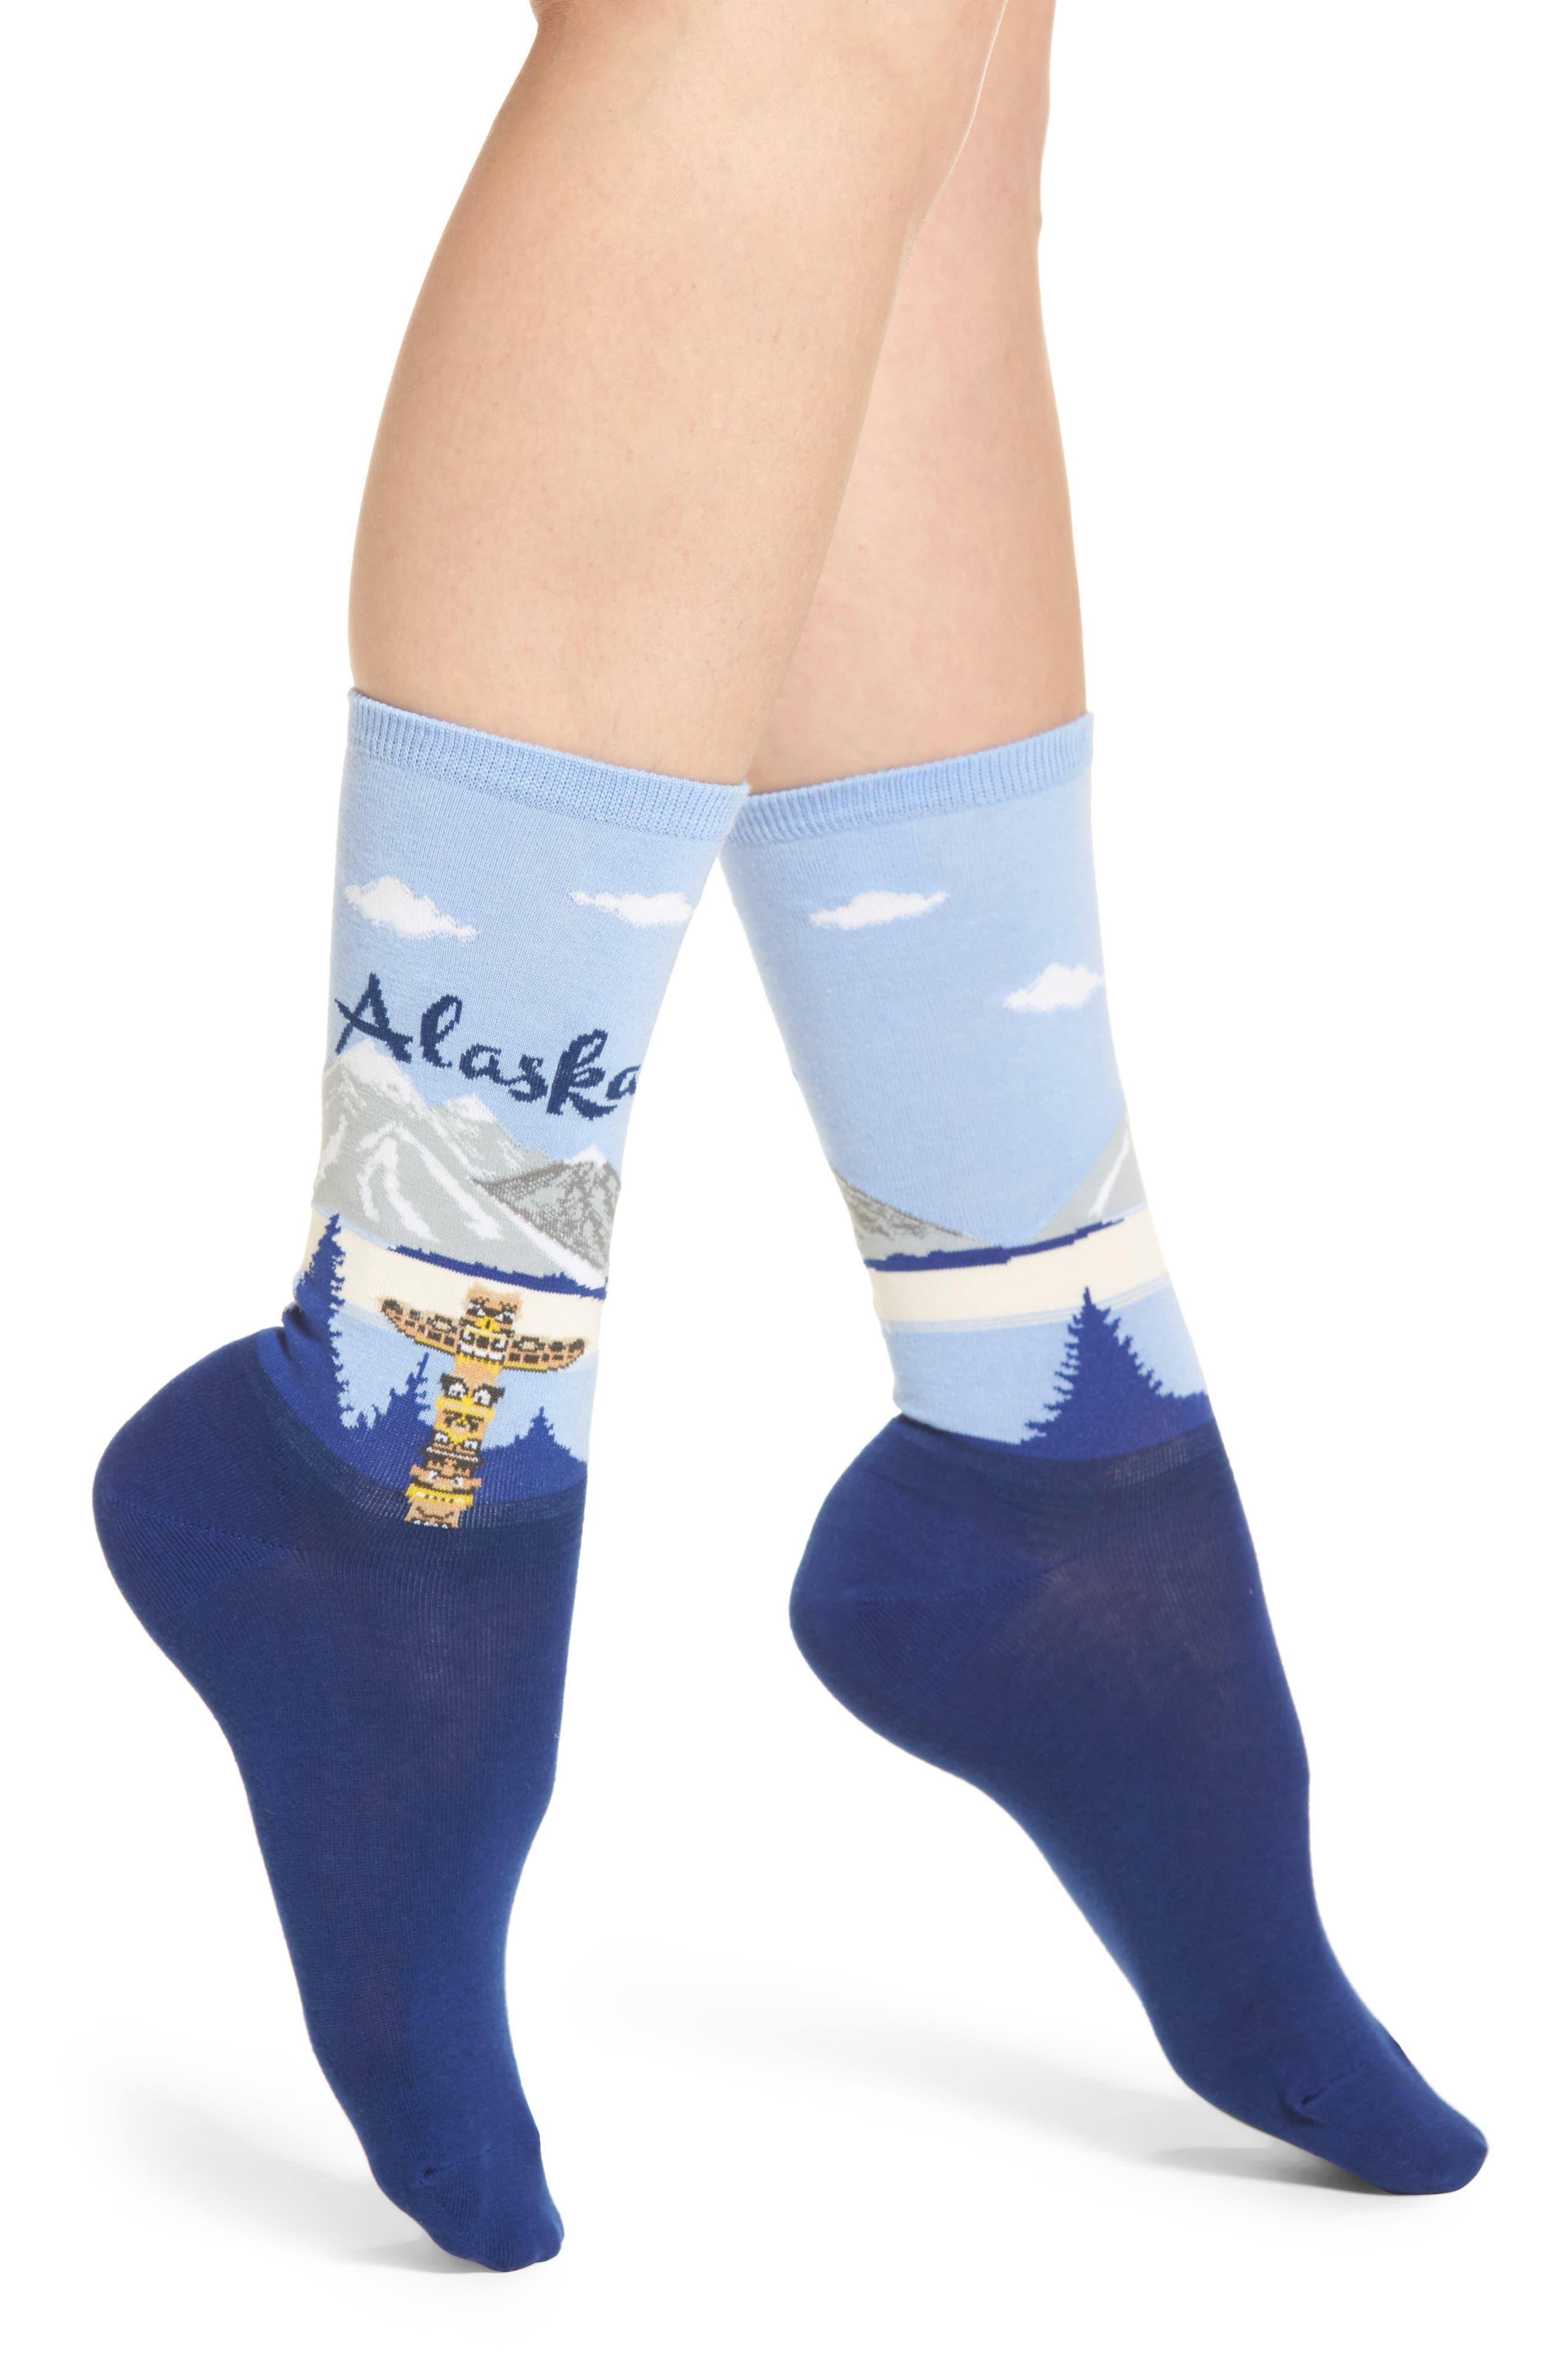 Travel Series - Alaska Crew Socks,                         Main,                         color, 439